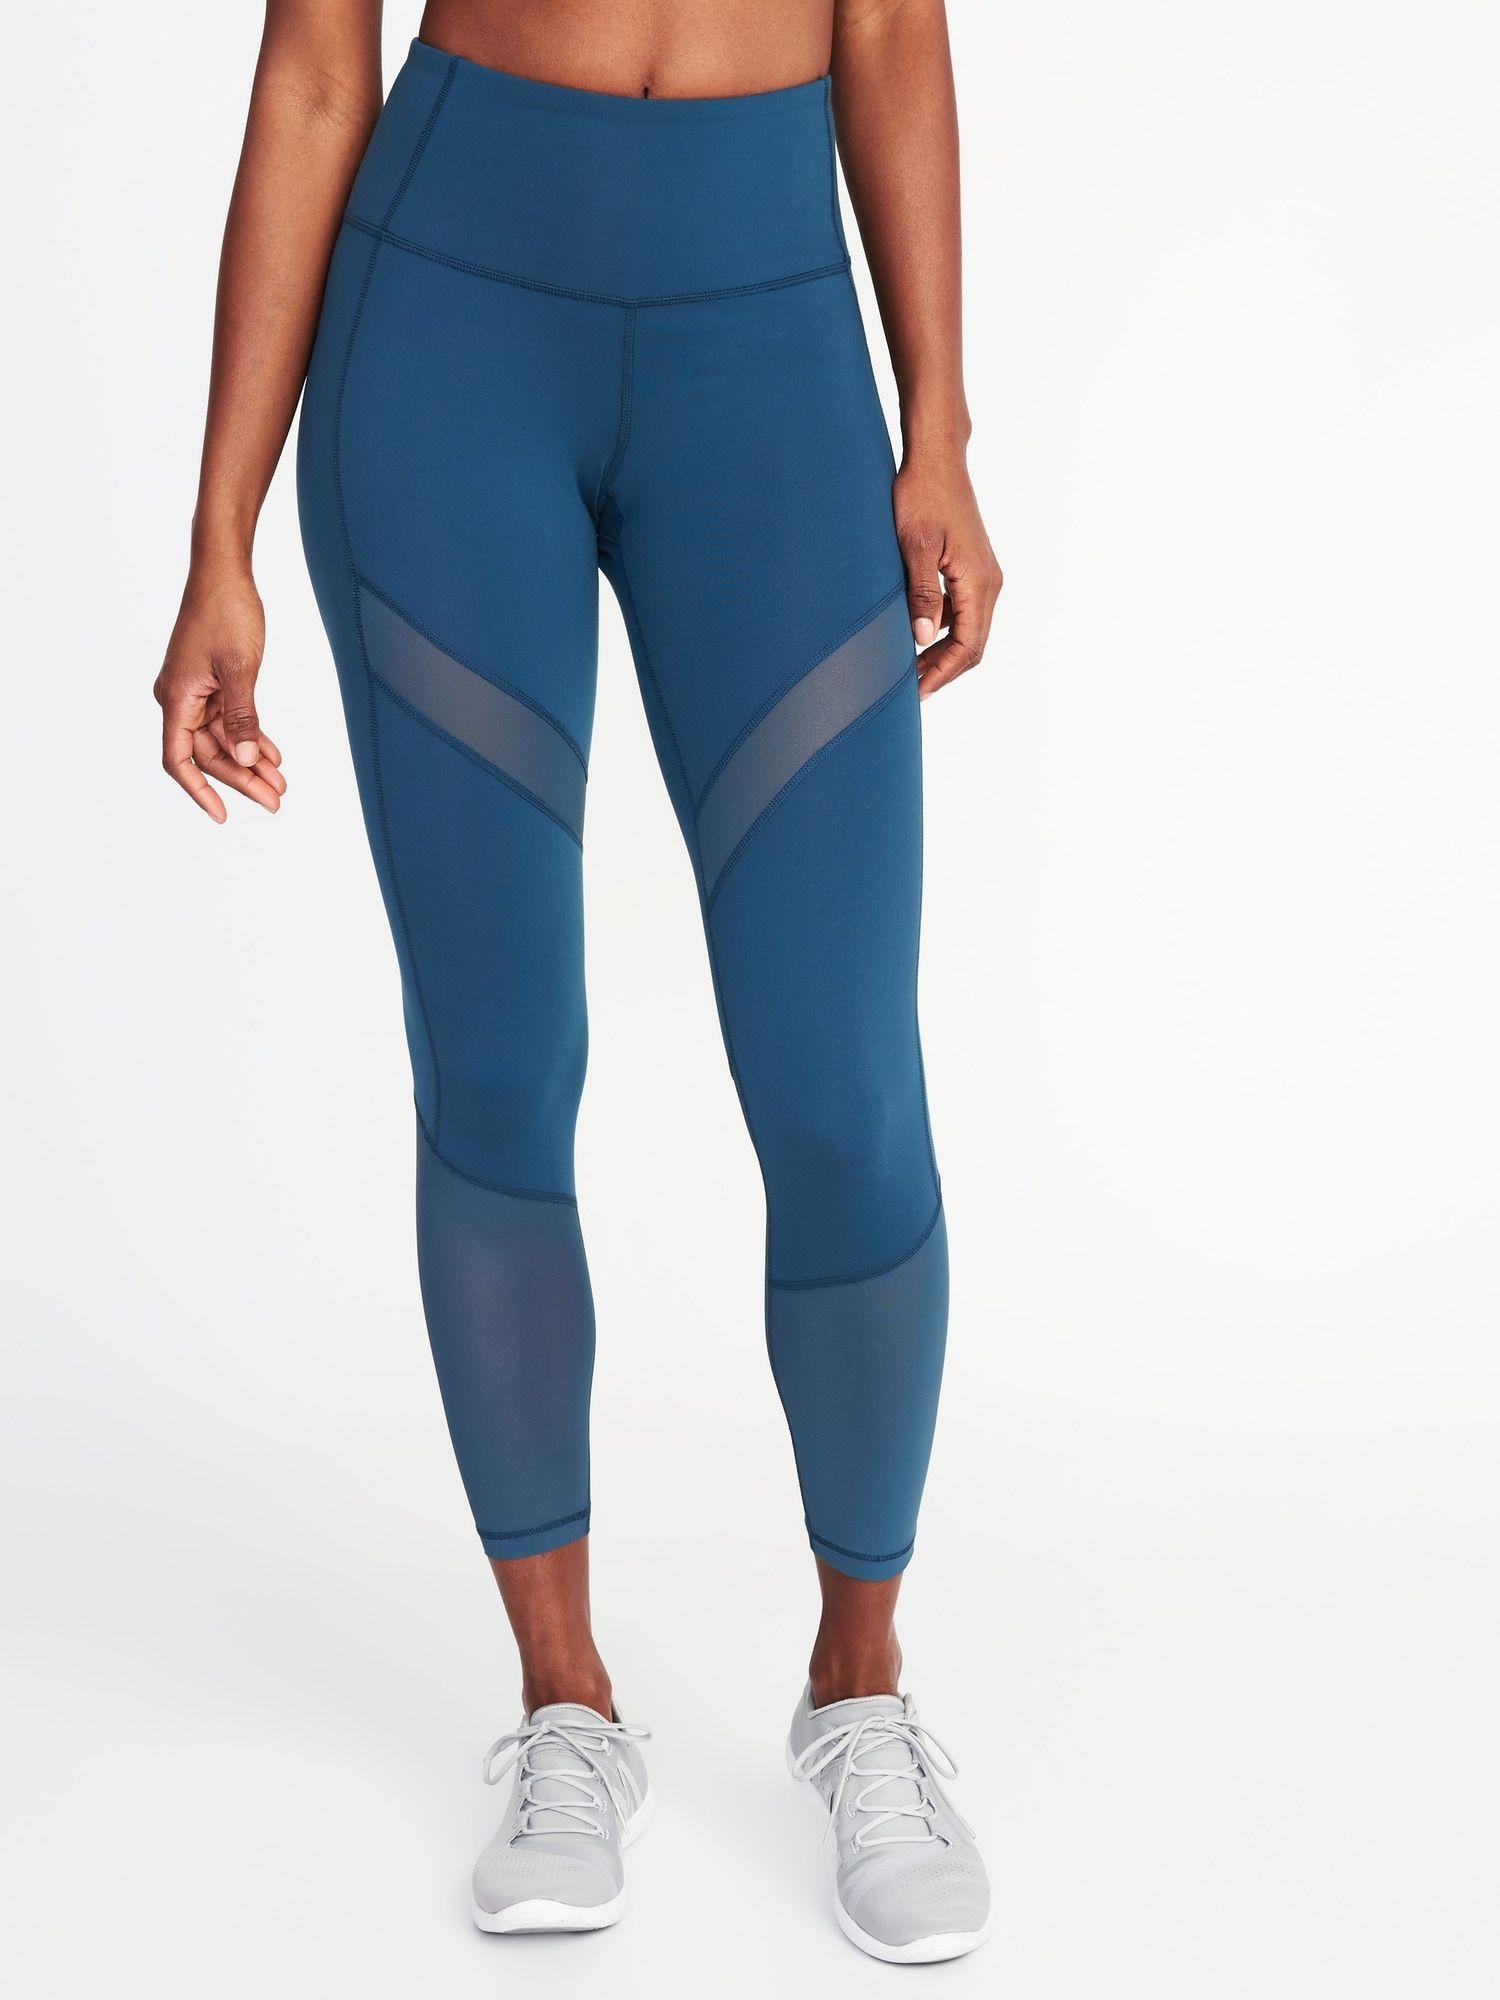 16da178e521b $15 | Small | Sea Something Workout Pants, Workout Wear, Women's Leggings,  Leggings